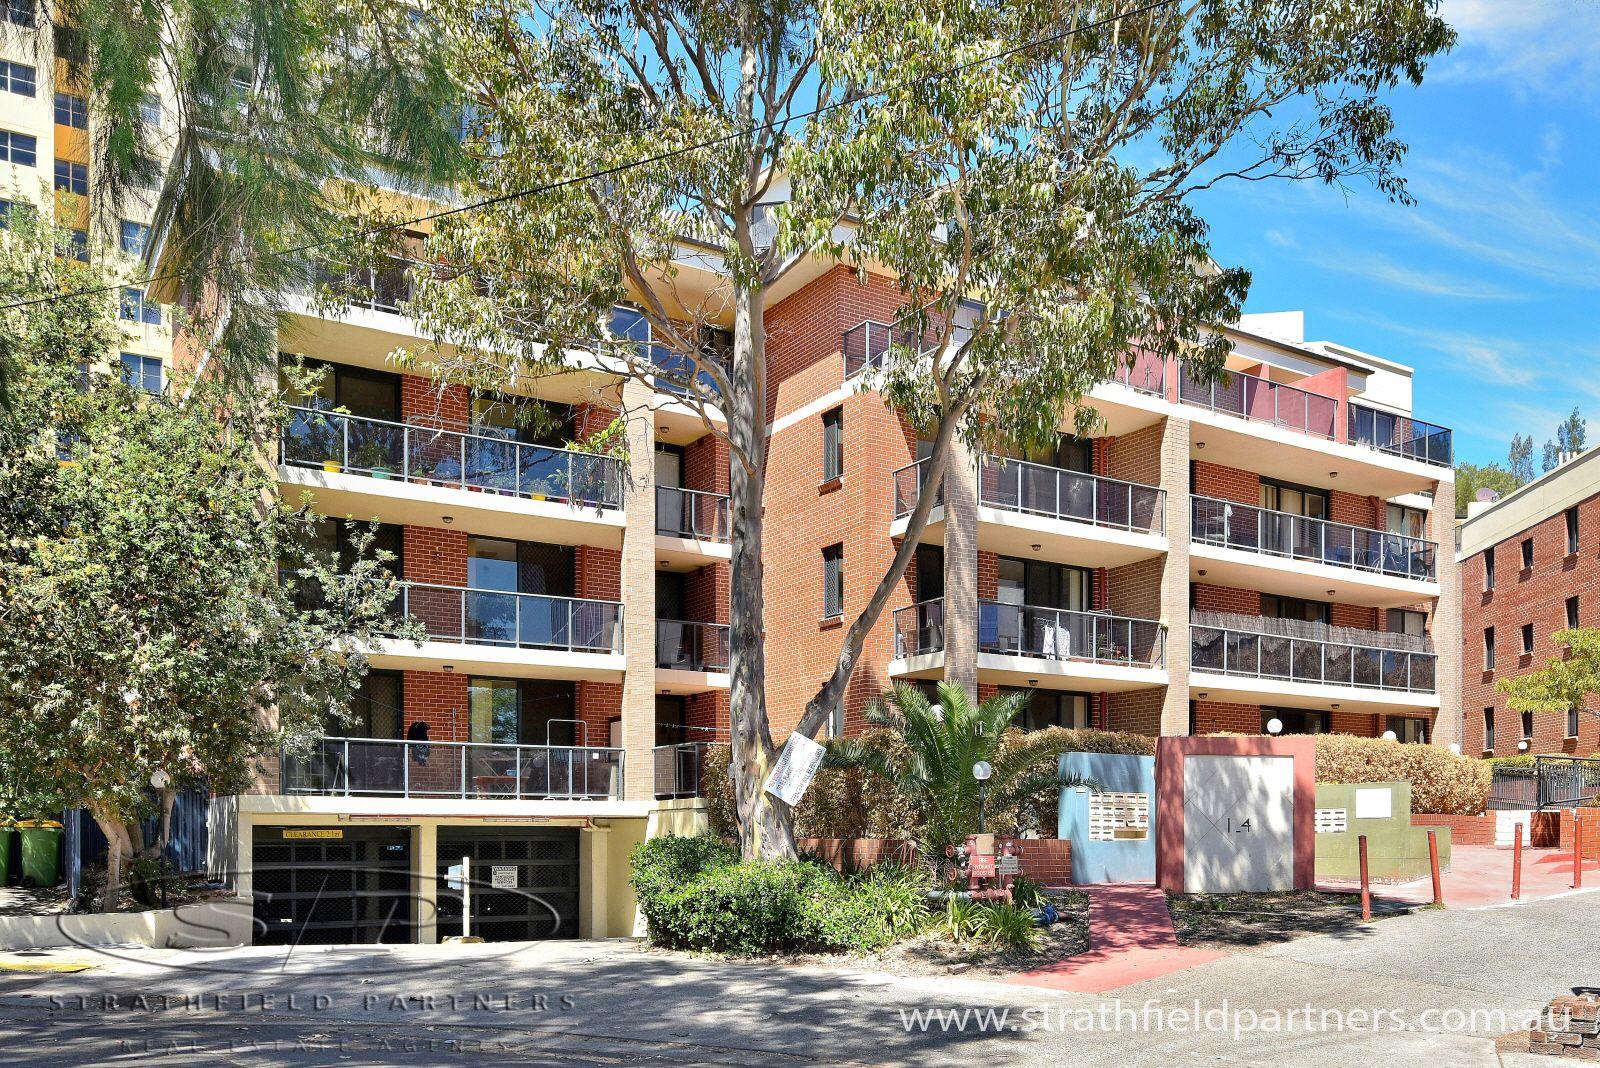 17/1-4 The Crescent, Strathfield NSW 2135, Image 1